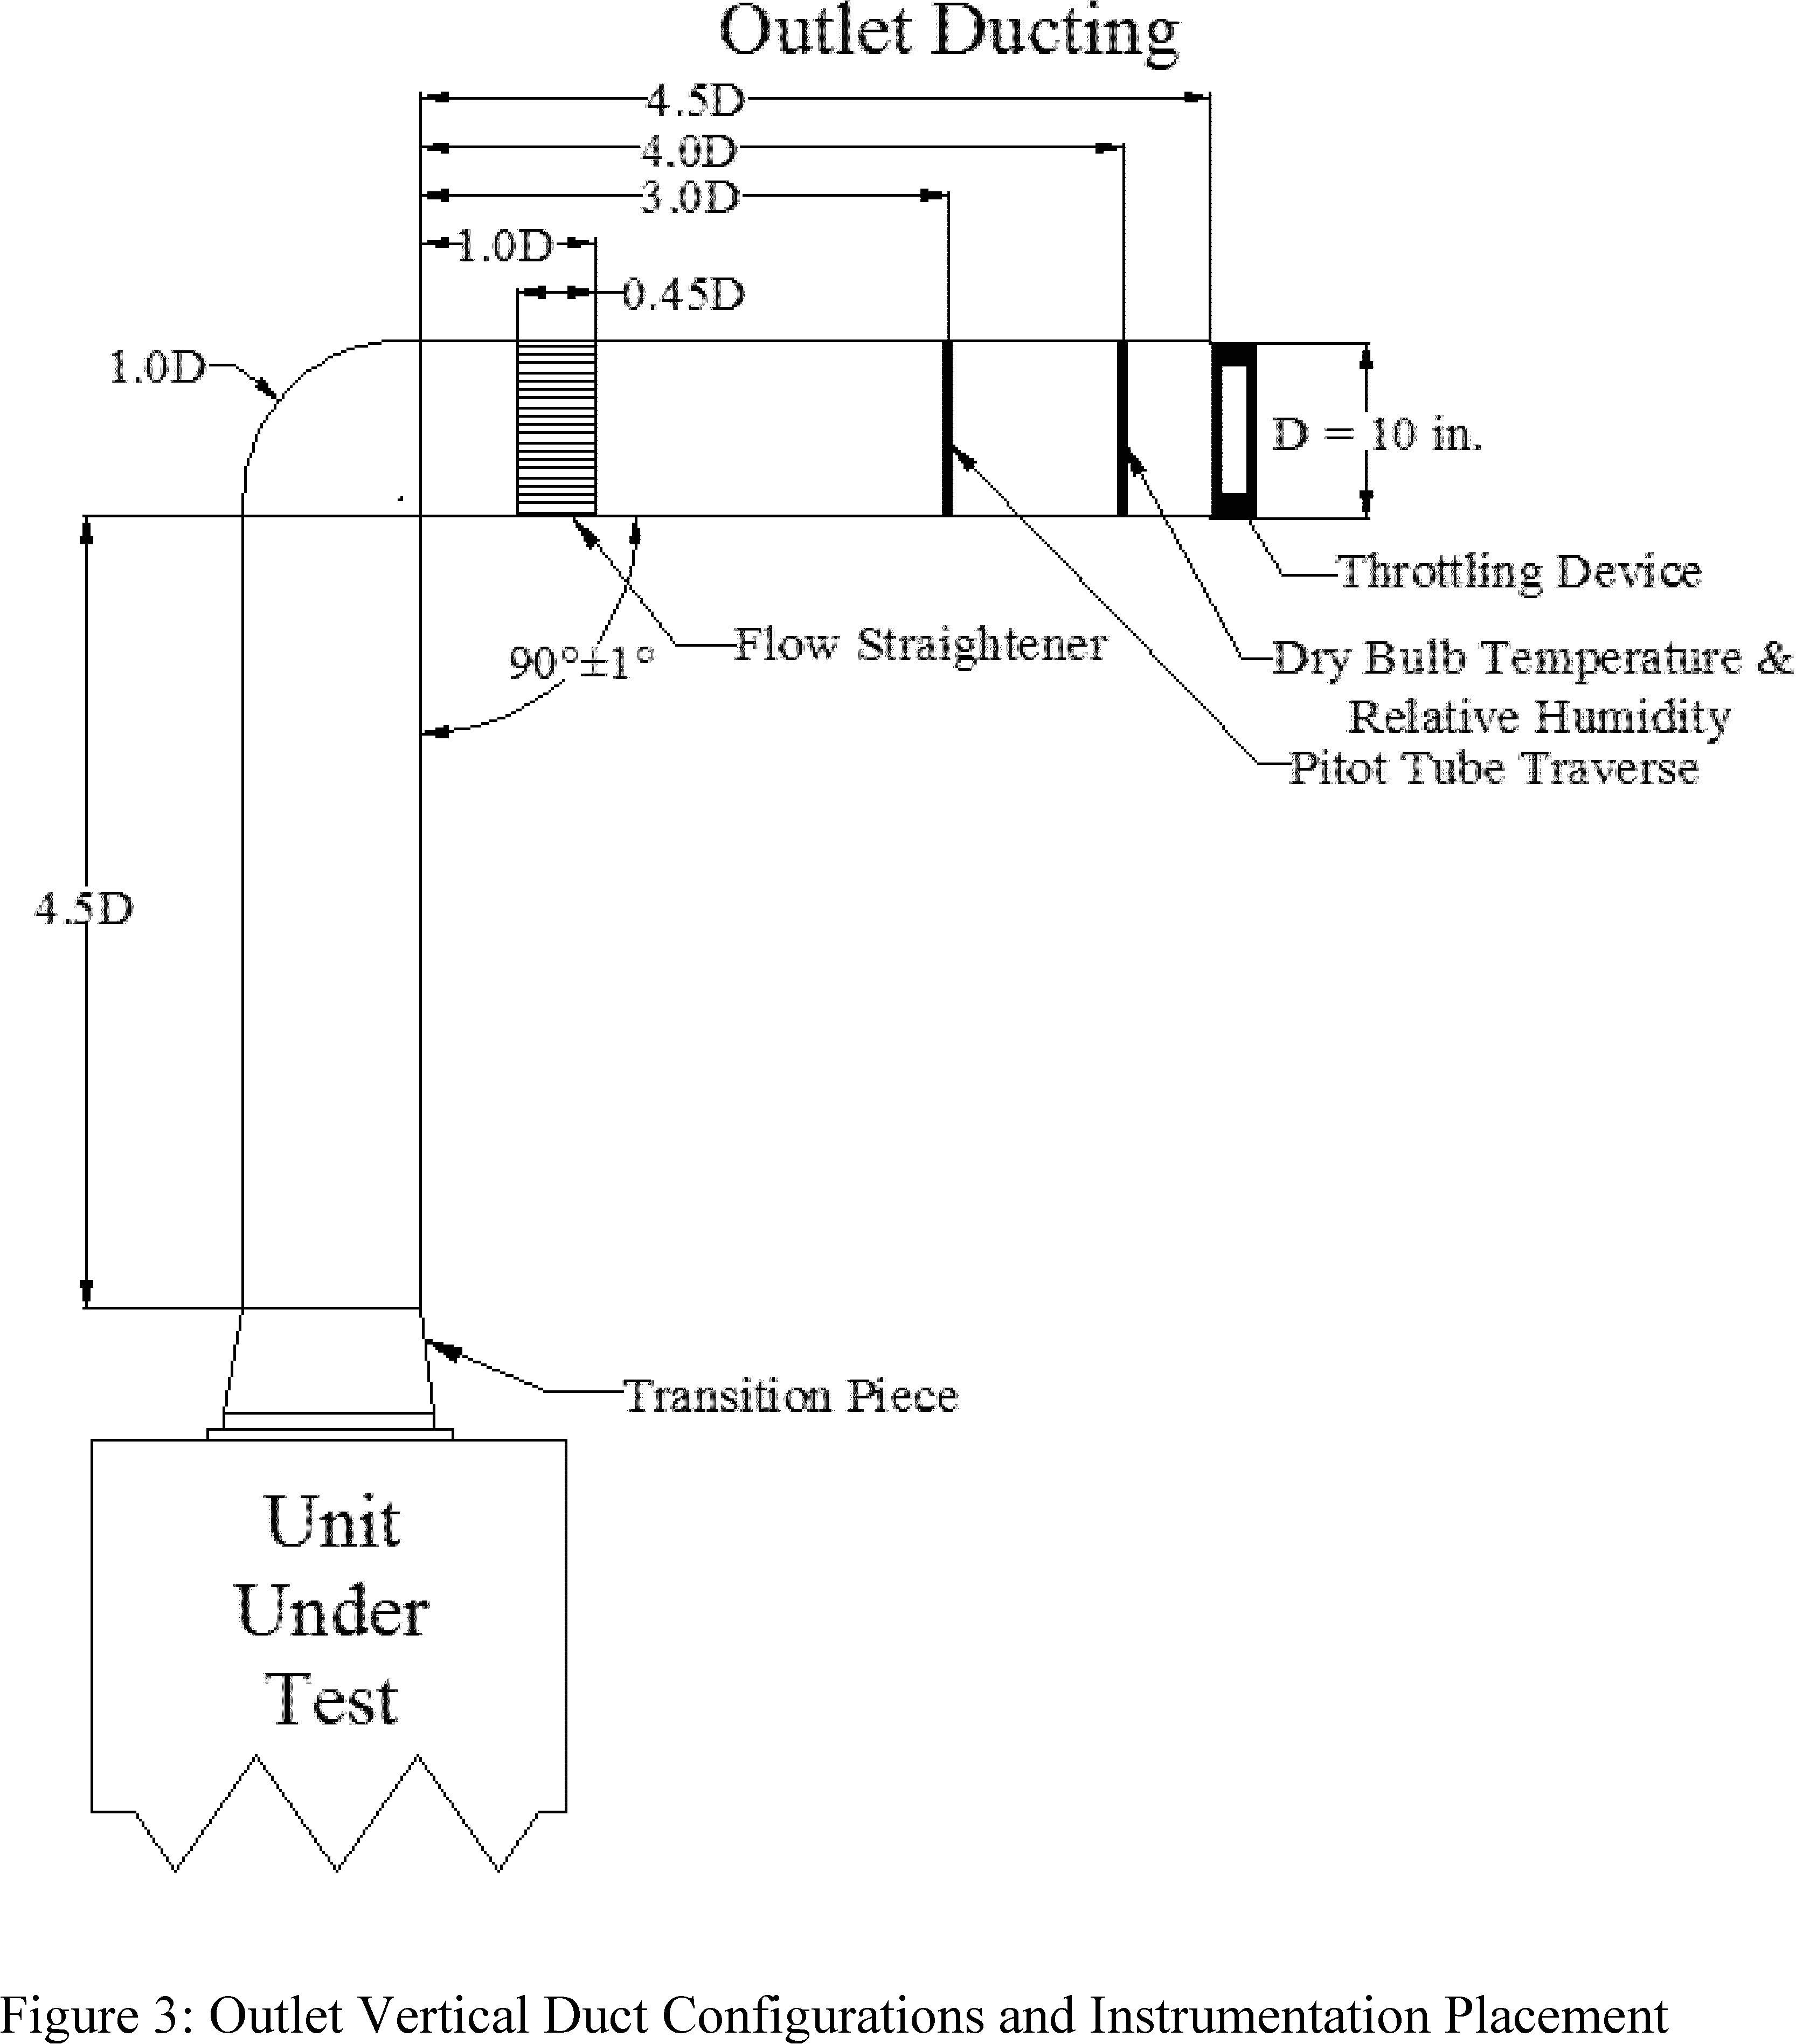 smtp wiring diagram wiring diagram expertsmtp wiring diagram wiring diagram centre chevrolet2009impalaengine diagram wiring diagram usedwiring